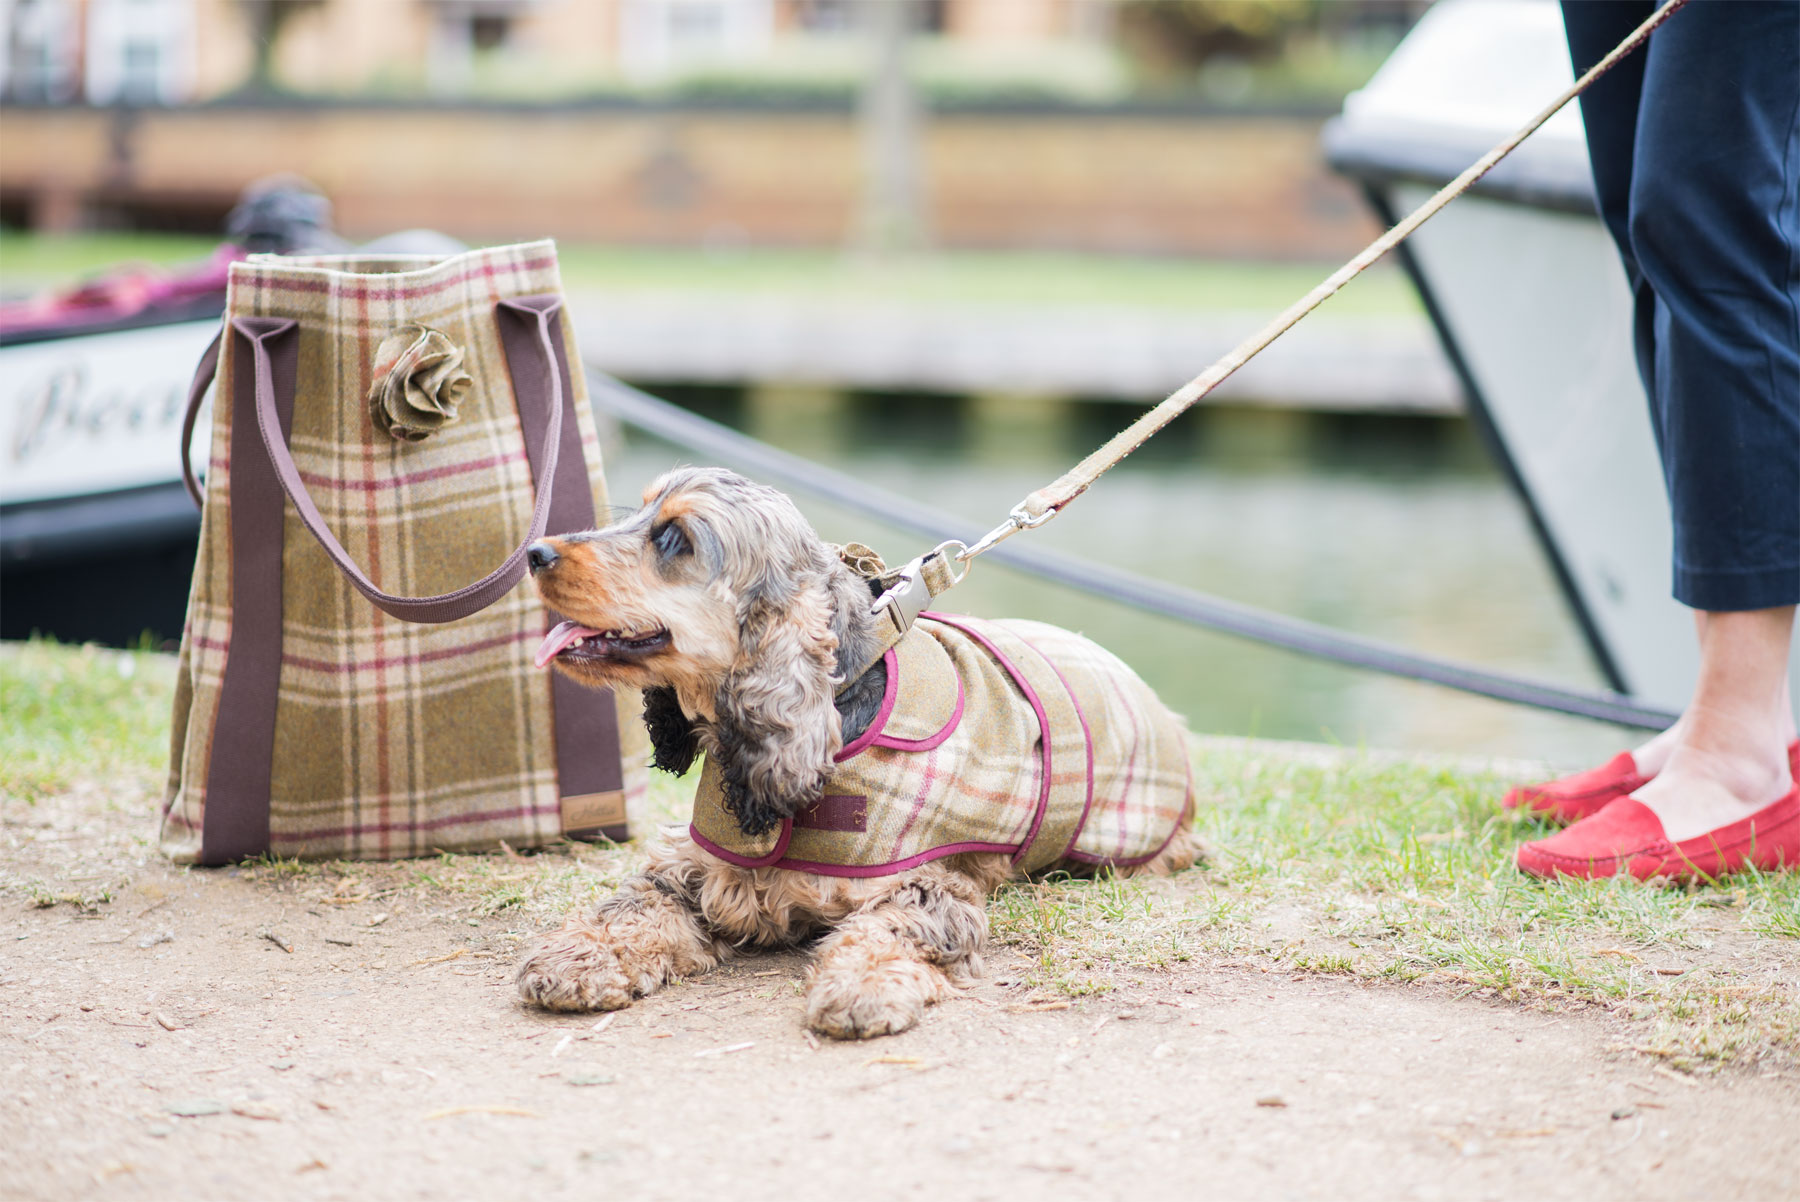 Lifestyle Brand Hettie Leads the Way in Premium Pet Coordination